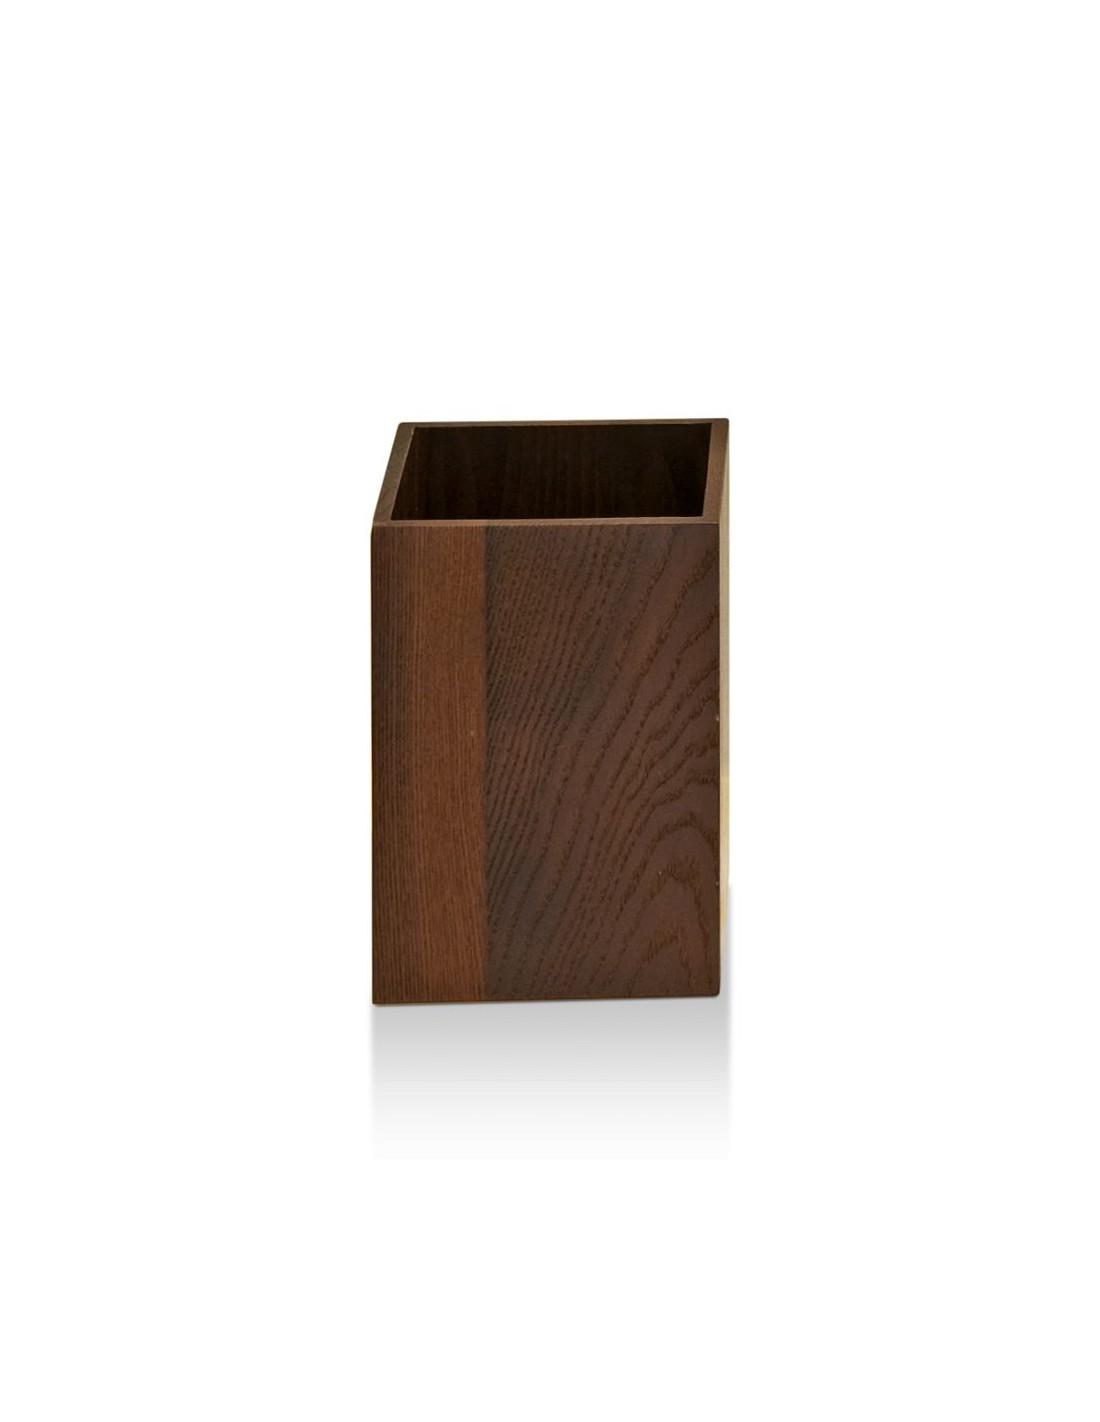 Corbeille à papier en bois Massif Wood WO PK en frêne thermo huilé foncé Decor Walther